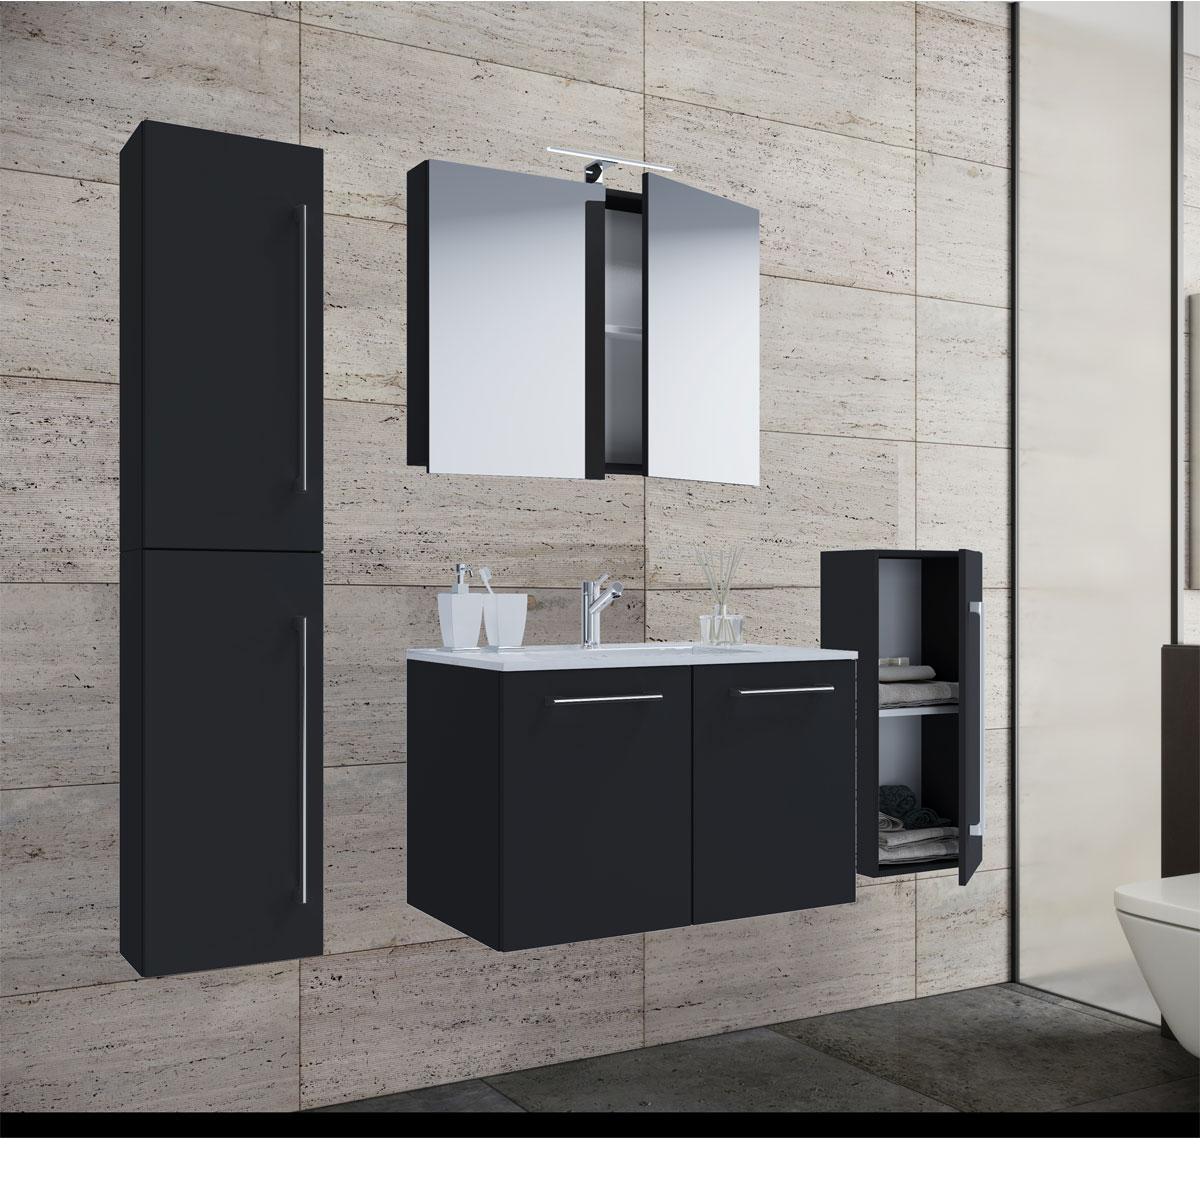 60 Cm Waschplatz Set